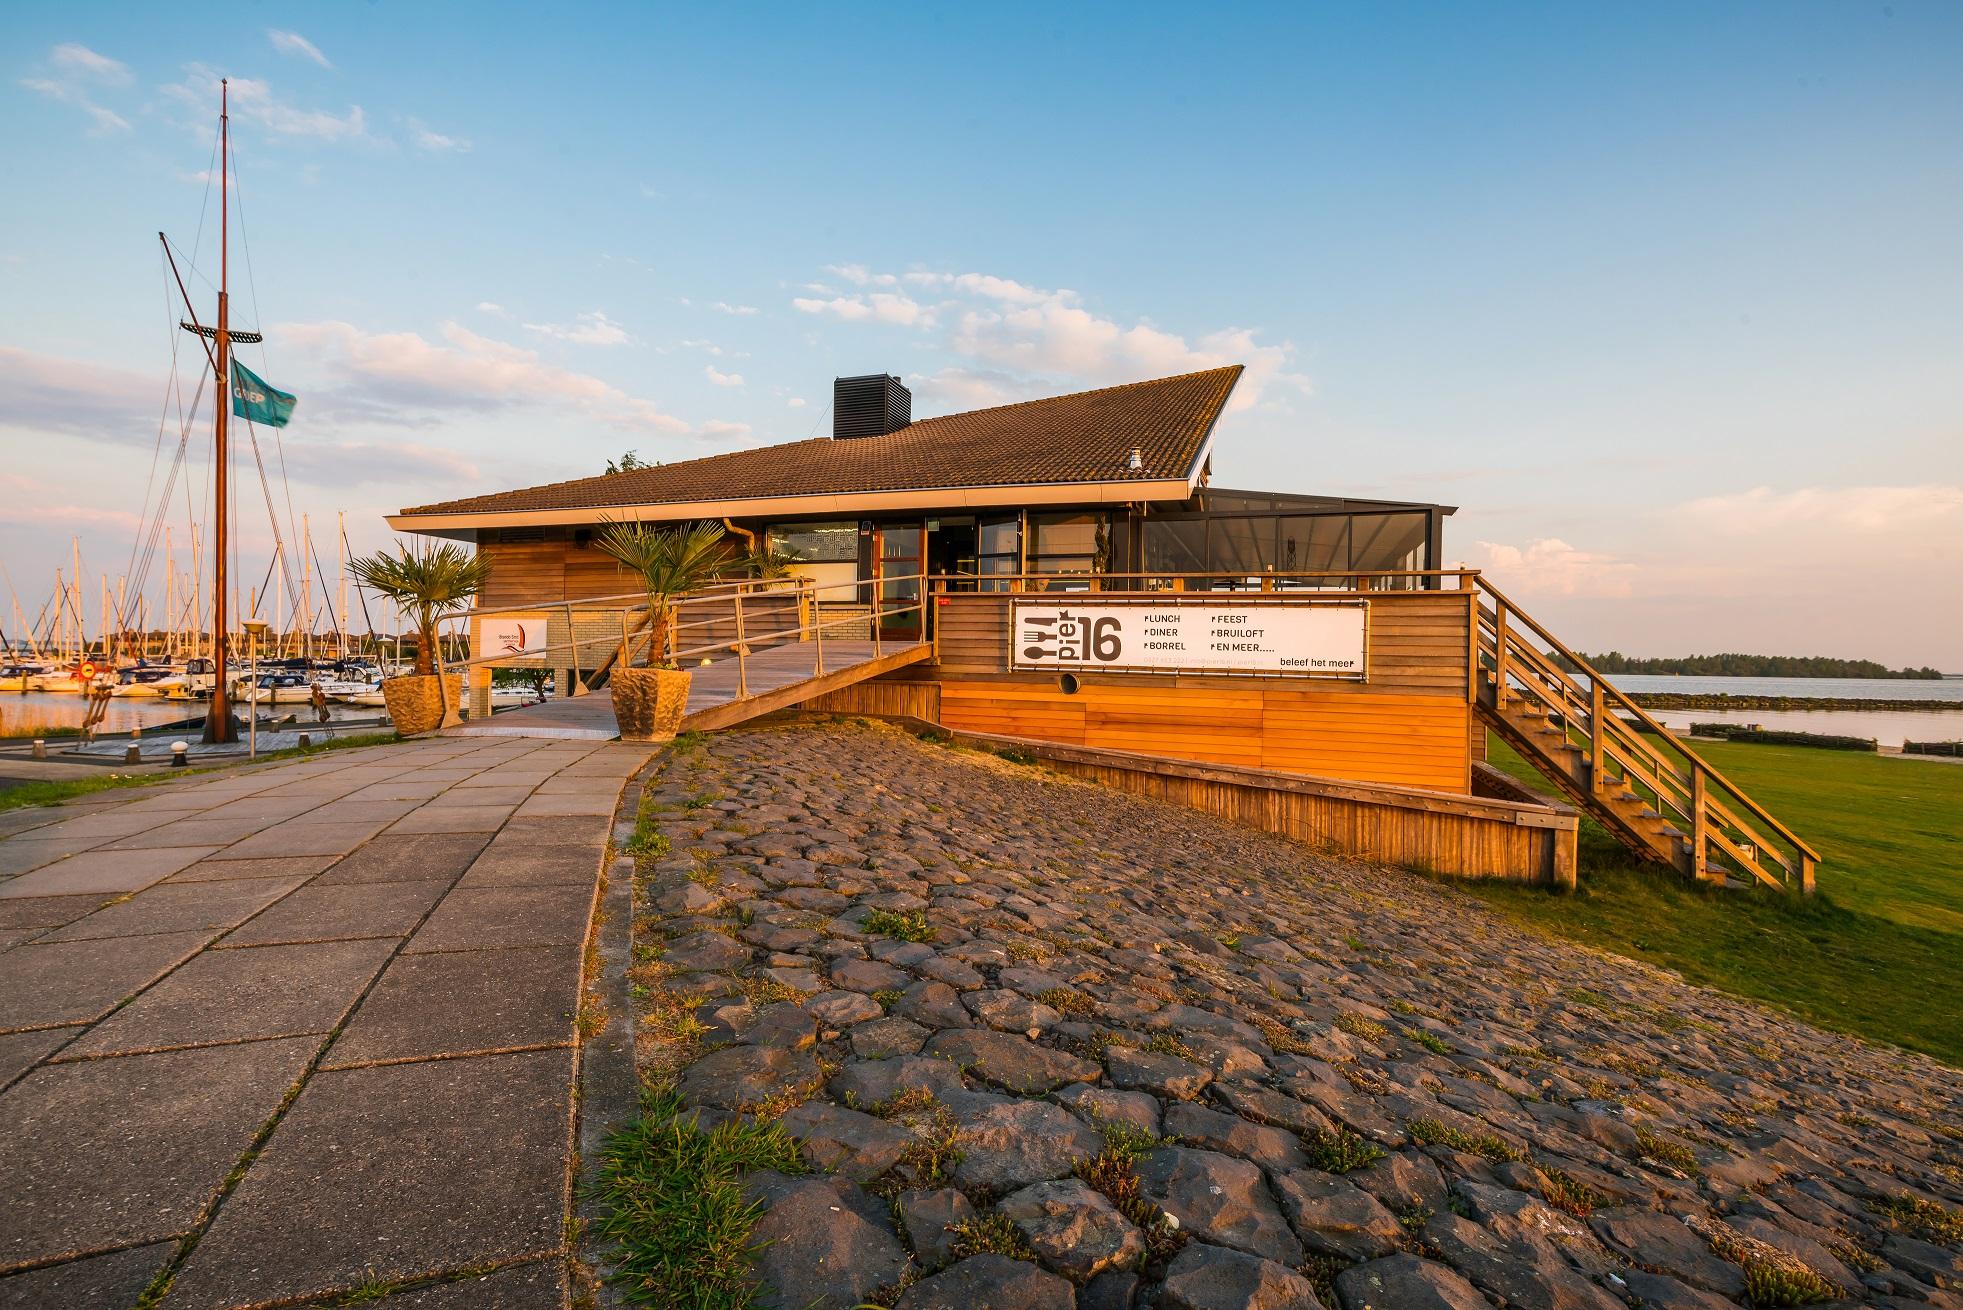 Nagele Pier 16